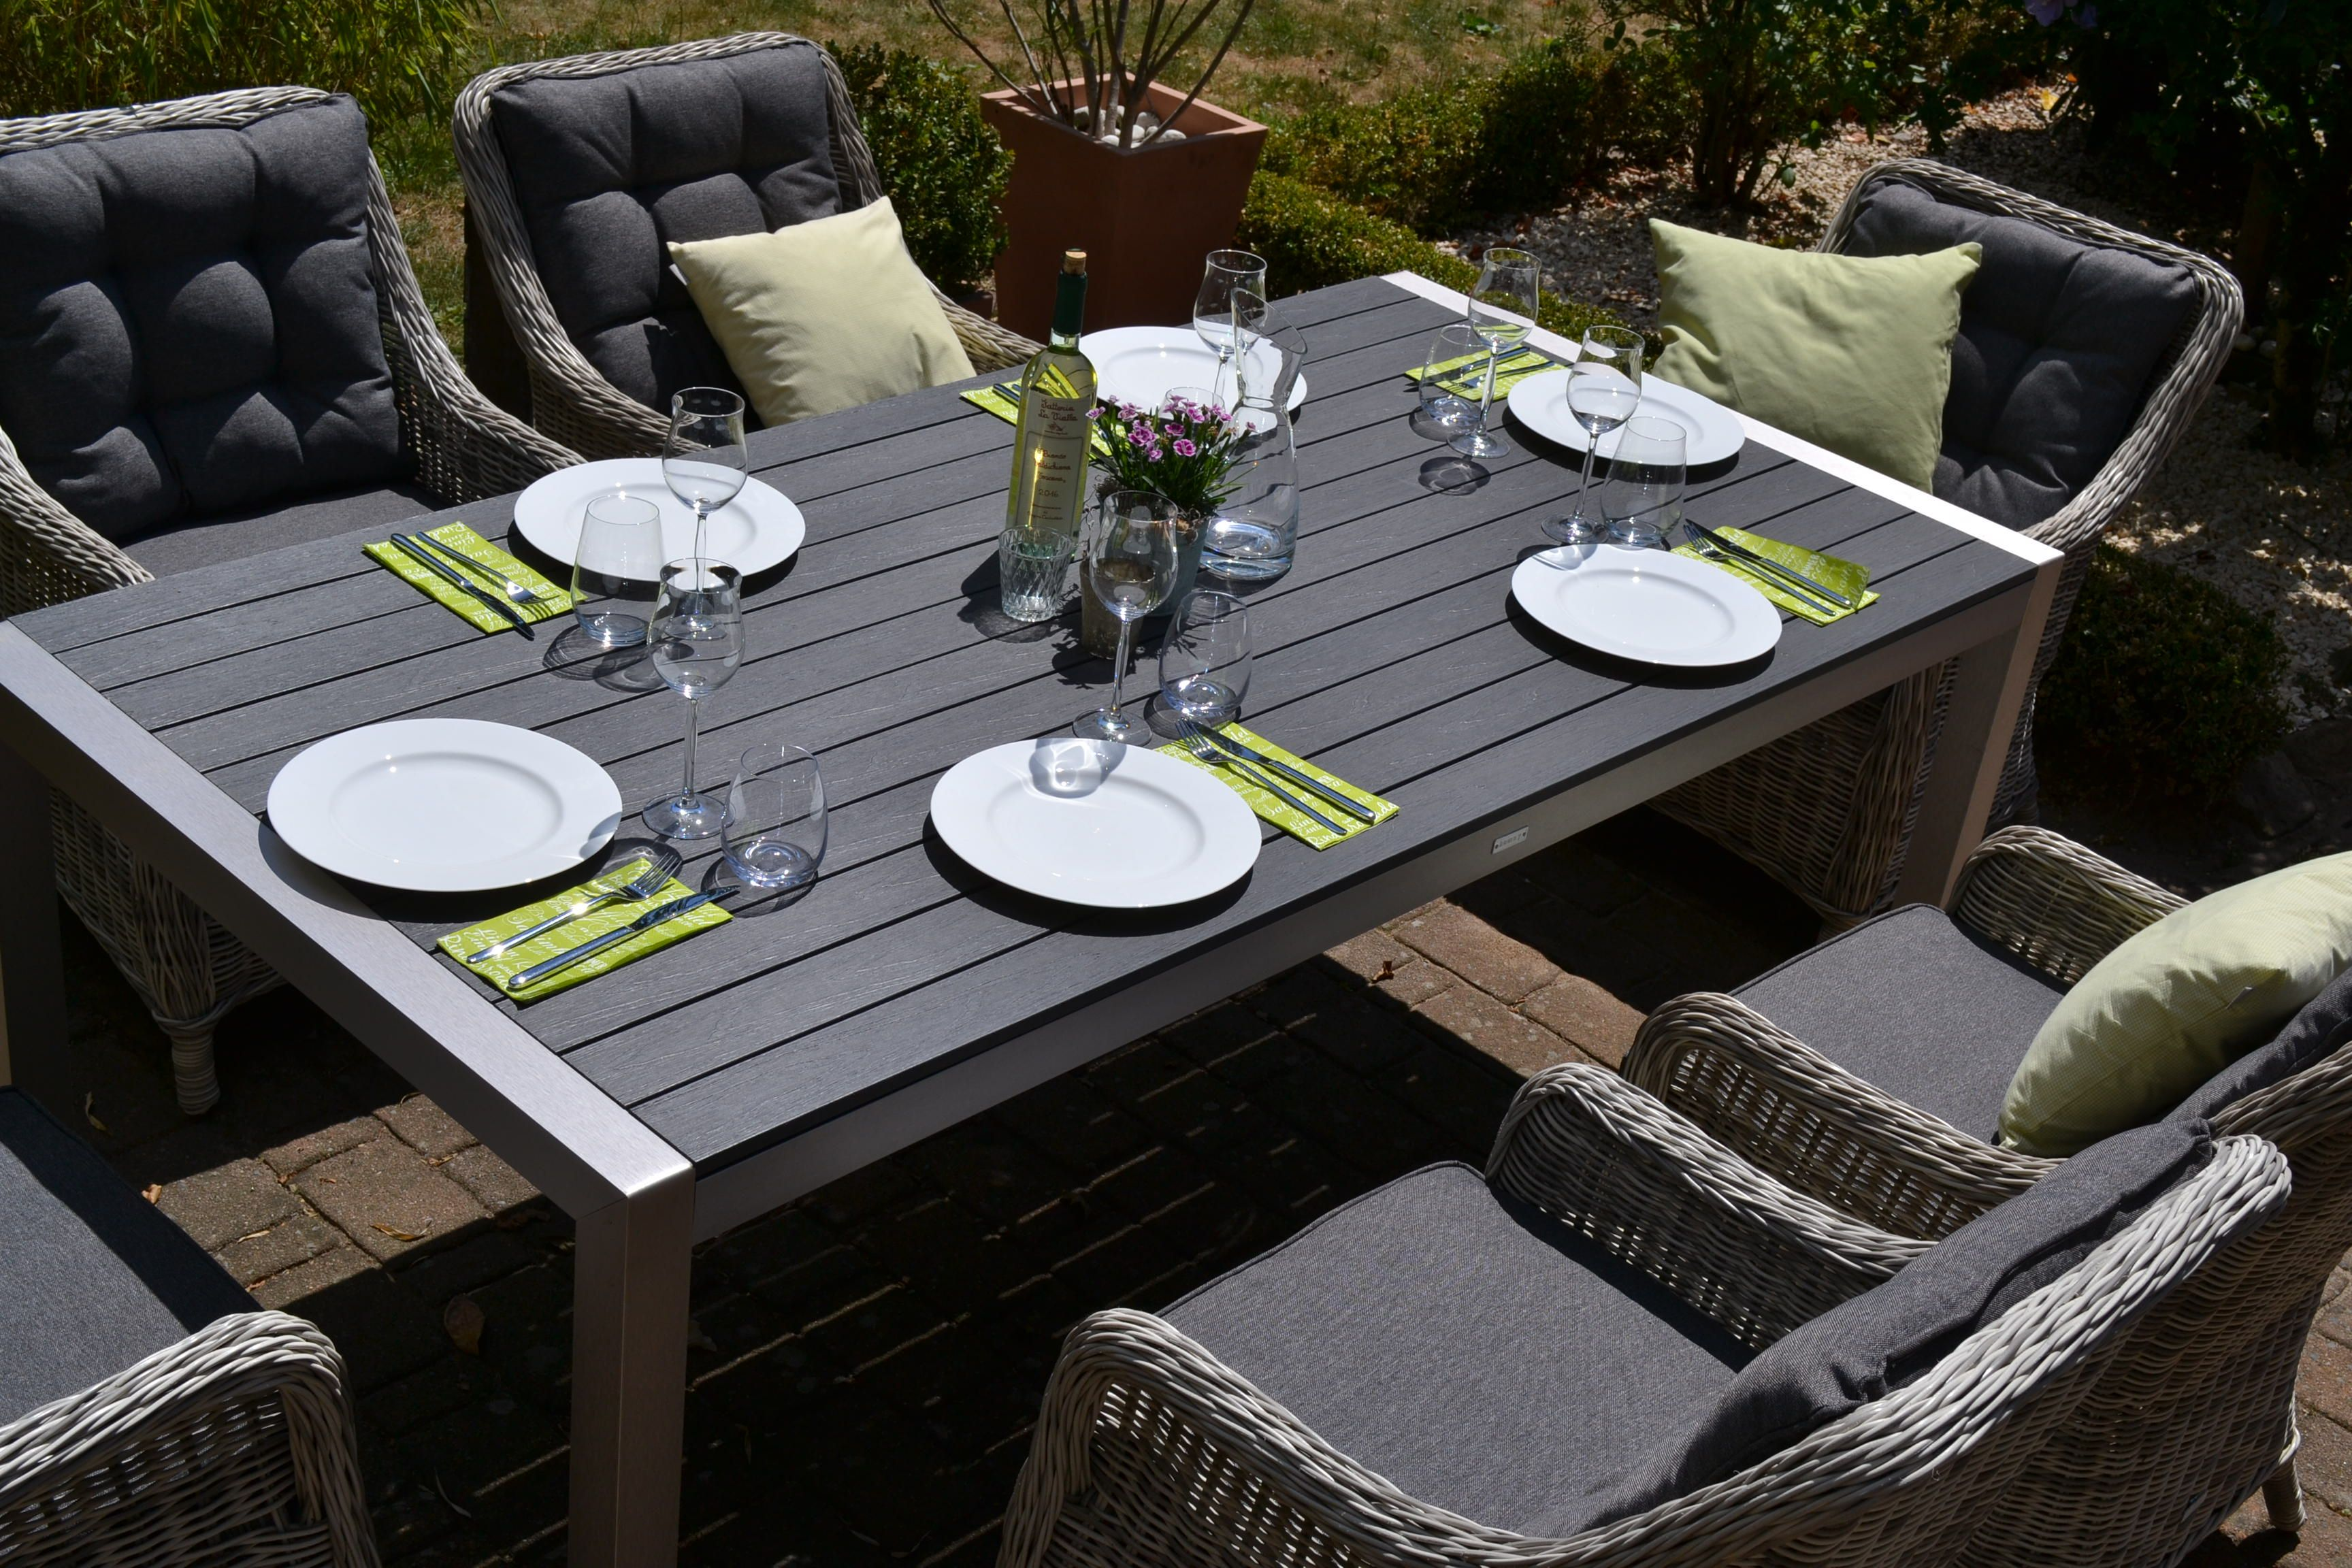 Sitzgruppe Miami 200x100cm Mit 6 Sesseln Grau Polster Grau Sitzgruppe Sessel Grau Gartenmobel